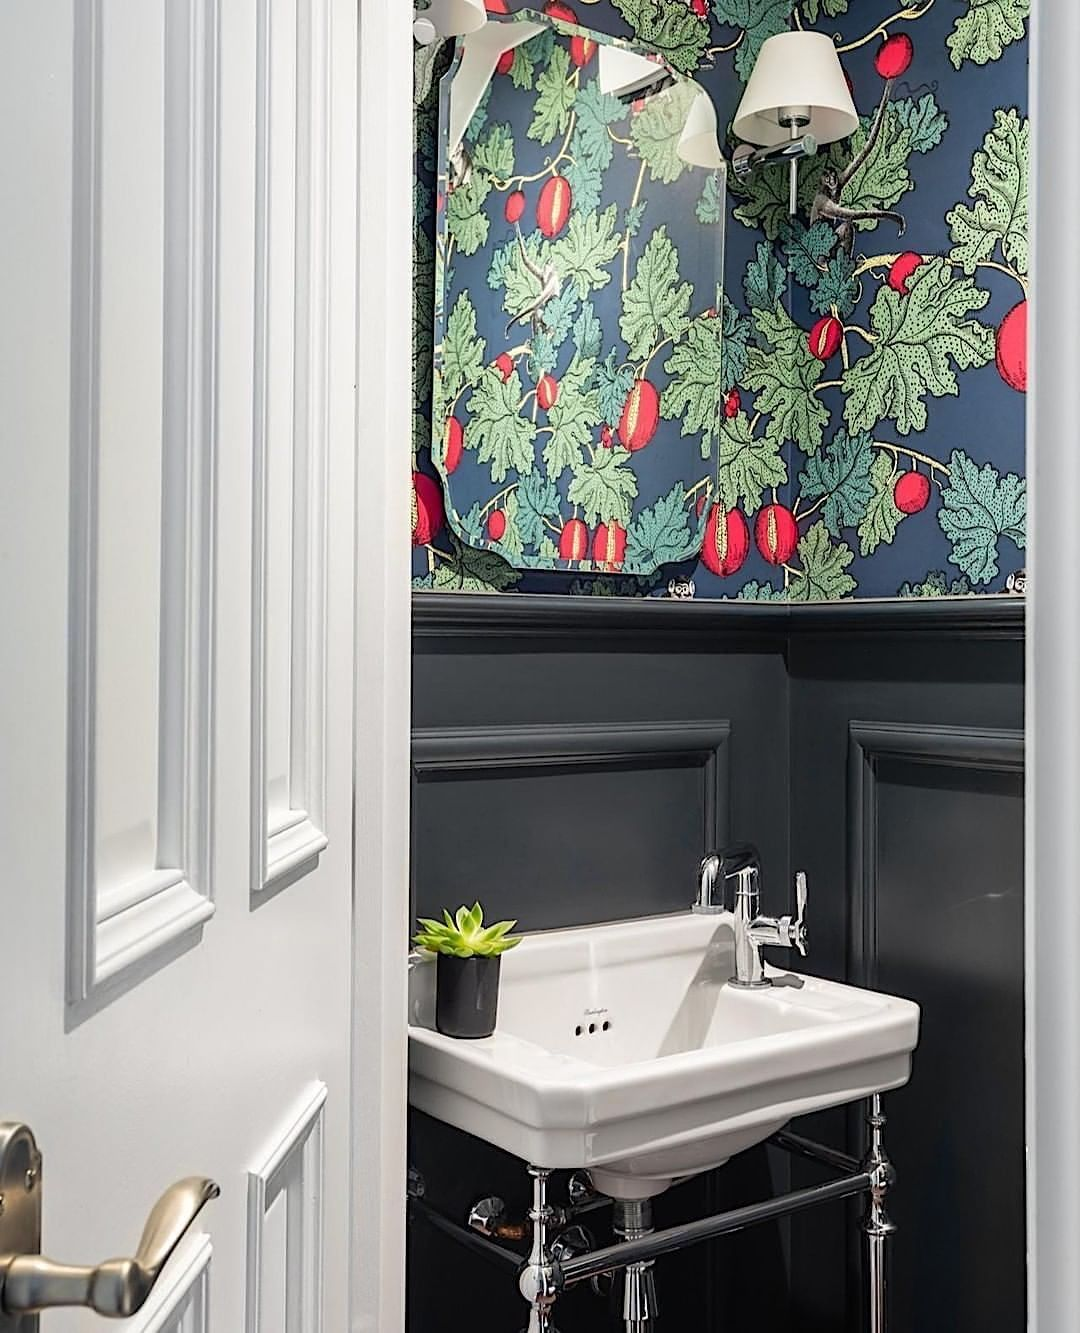 Badezimmer Burlington Bathrooms On Instagram A Simple And Effective Way To Update Interior Design Bathroom Small Burlington Bathroom Bathroom Interior Design